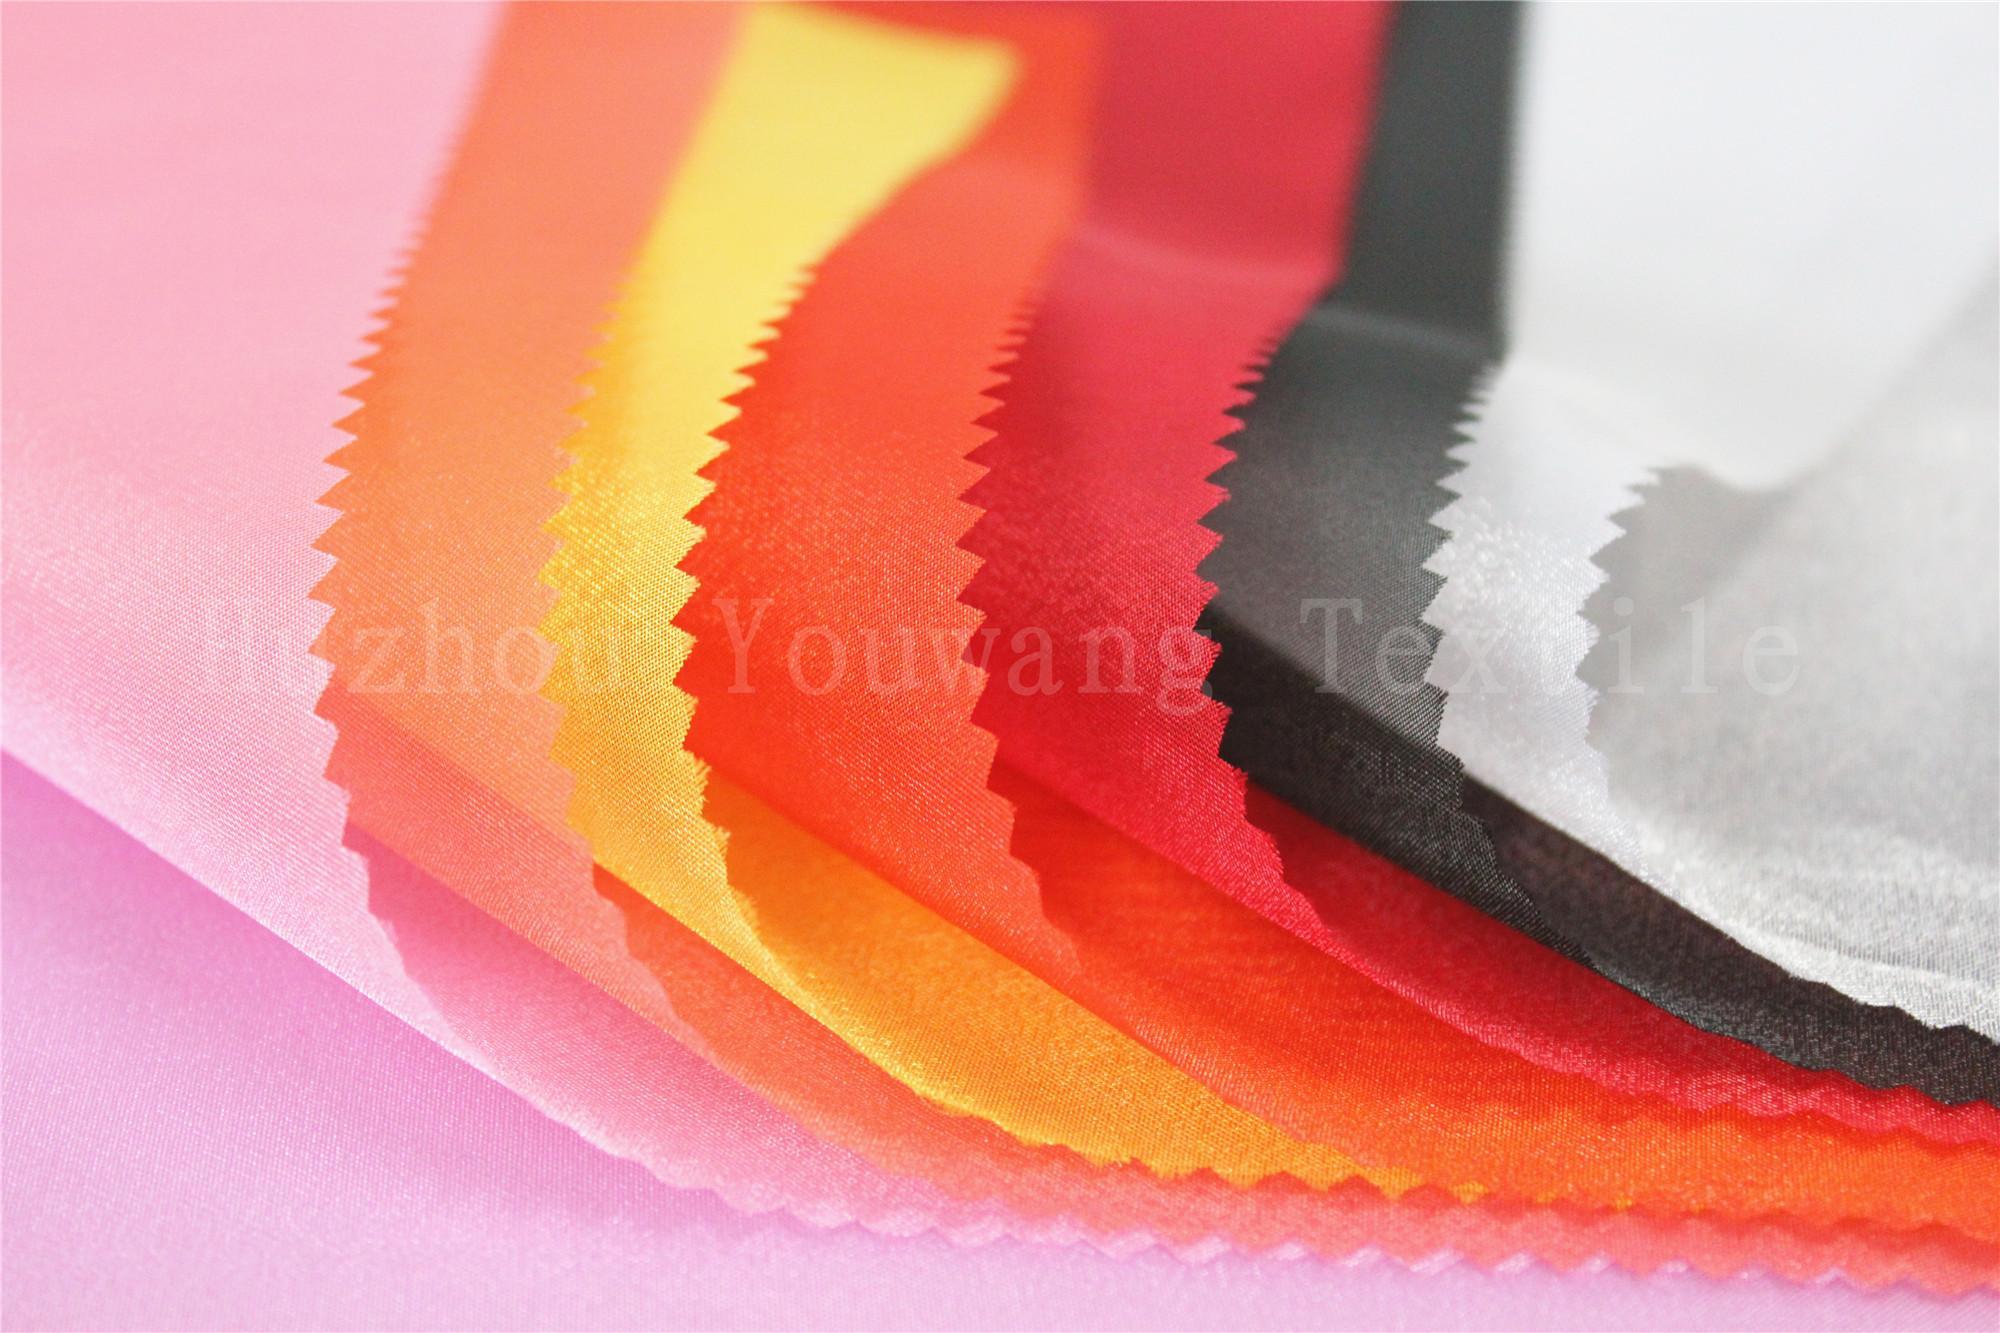 68D Crystal Organza Fabric 4